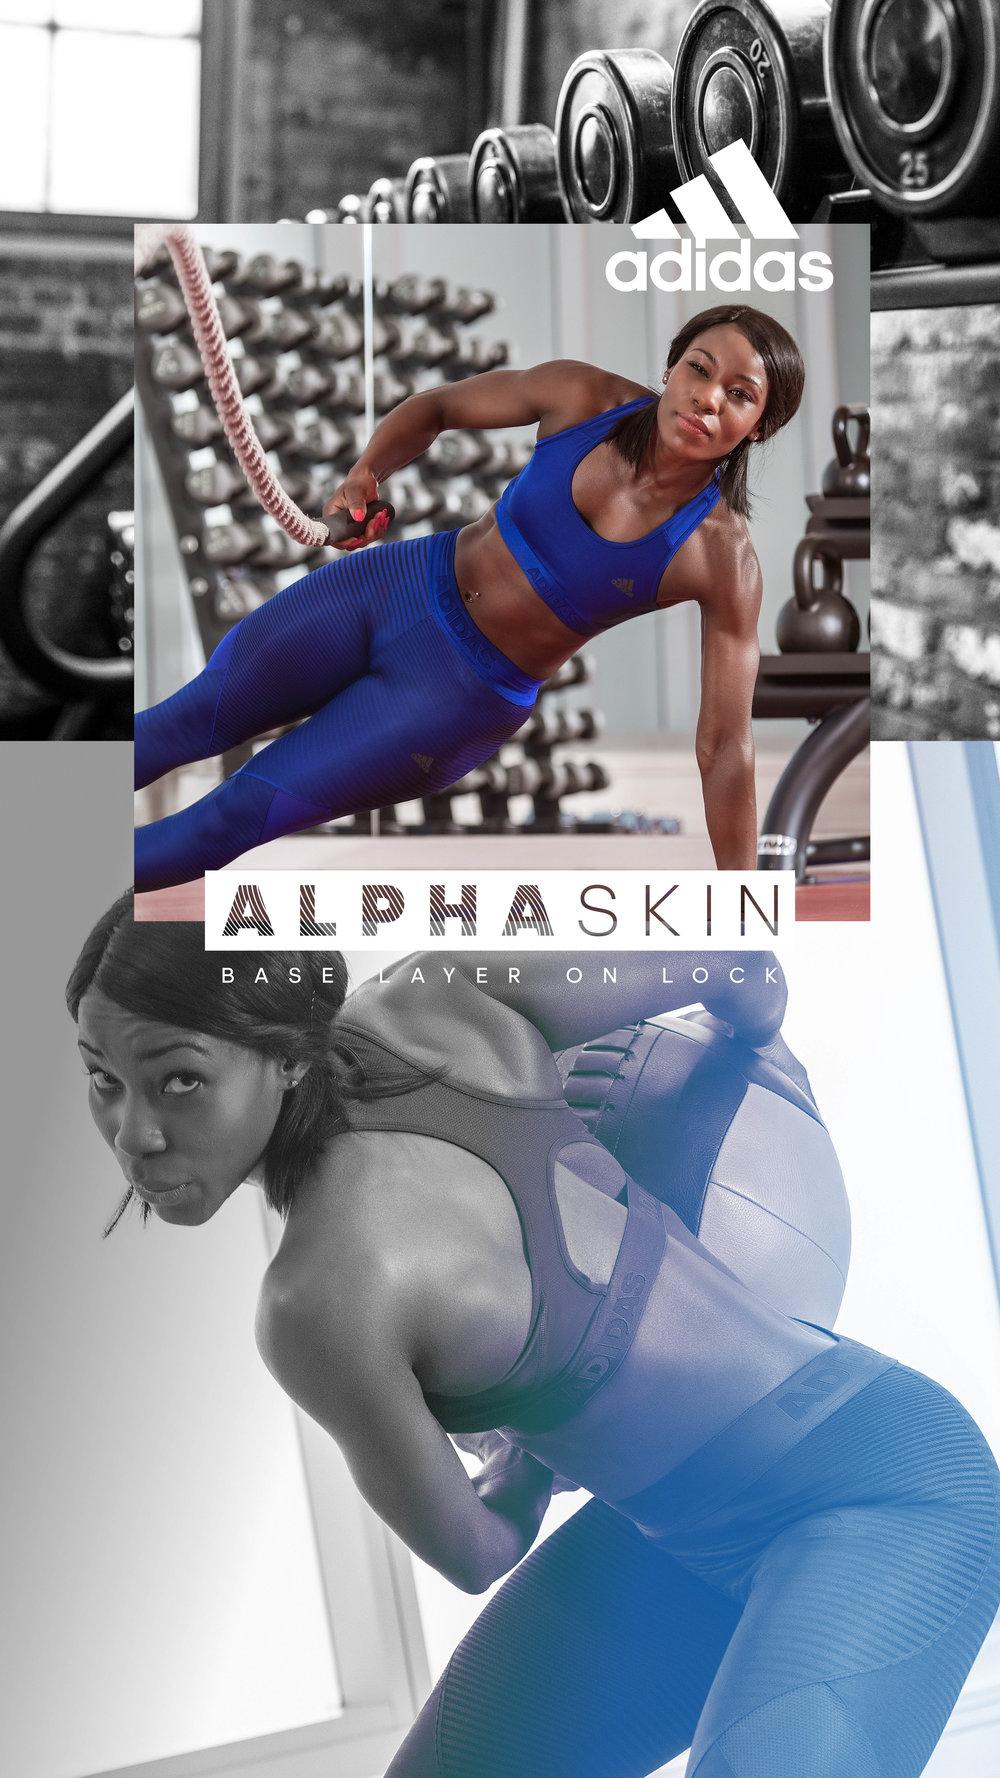 TALMARKES | adi_Alphaskin_Snapchat.jpg